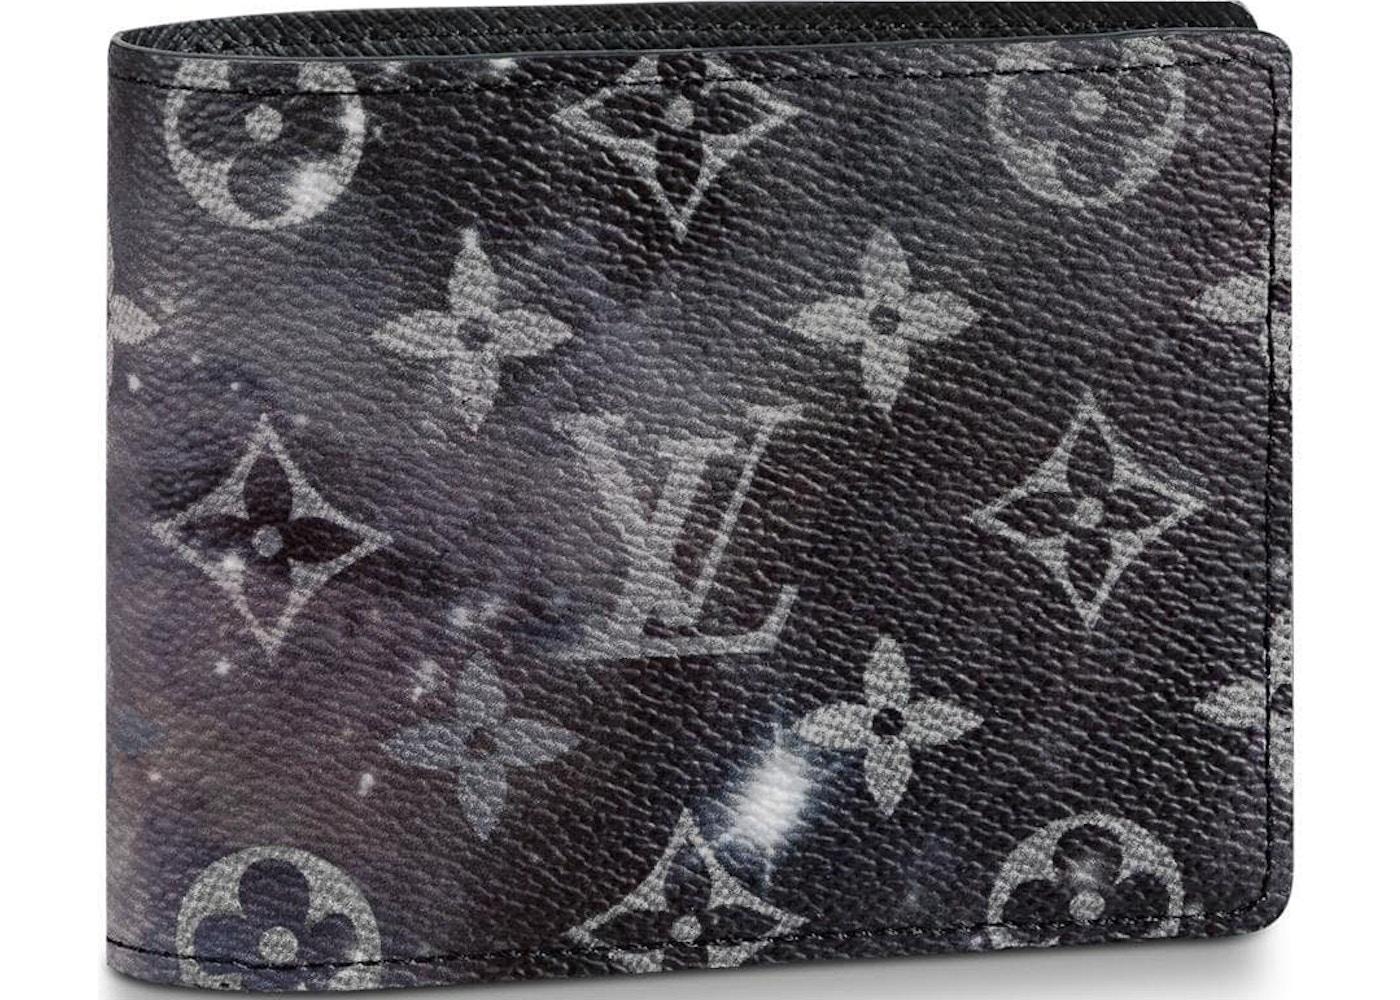 ef6f0e88be149 Buy & Sell Louis Vuitton Luxury Handbags